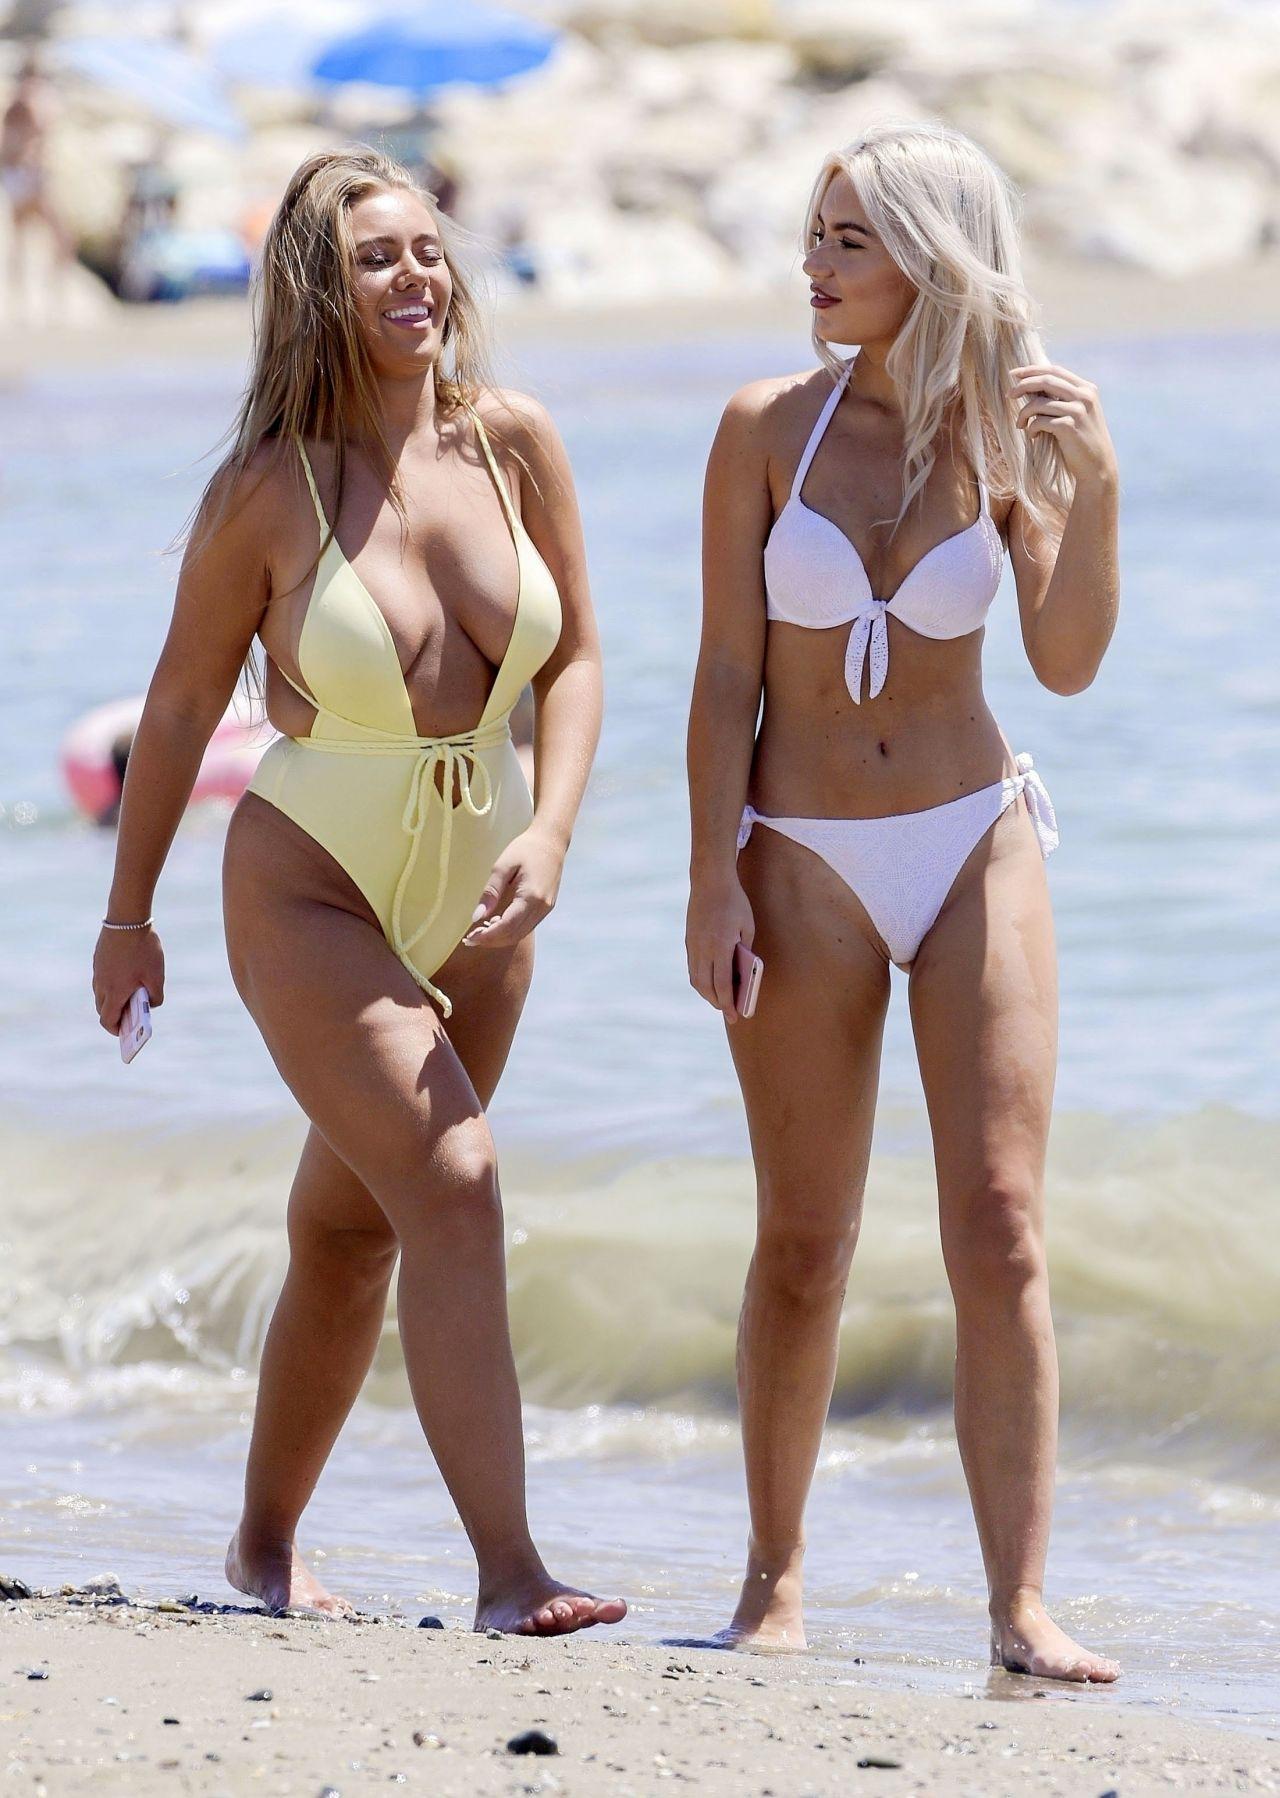 Tyne-Lexy Clarson nudes (32 photos), video Bikini, Instagram, cleavage 2017